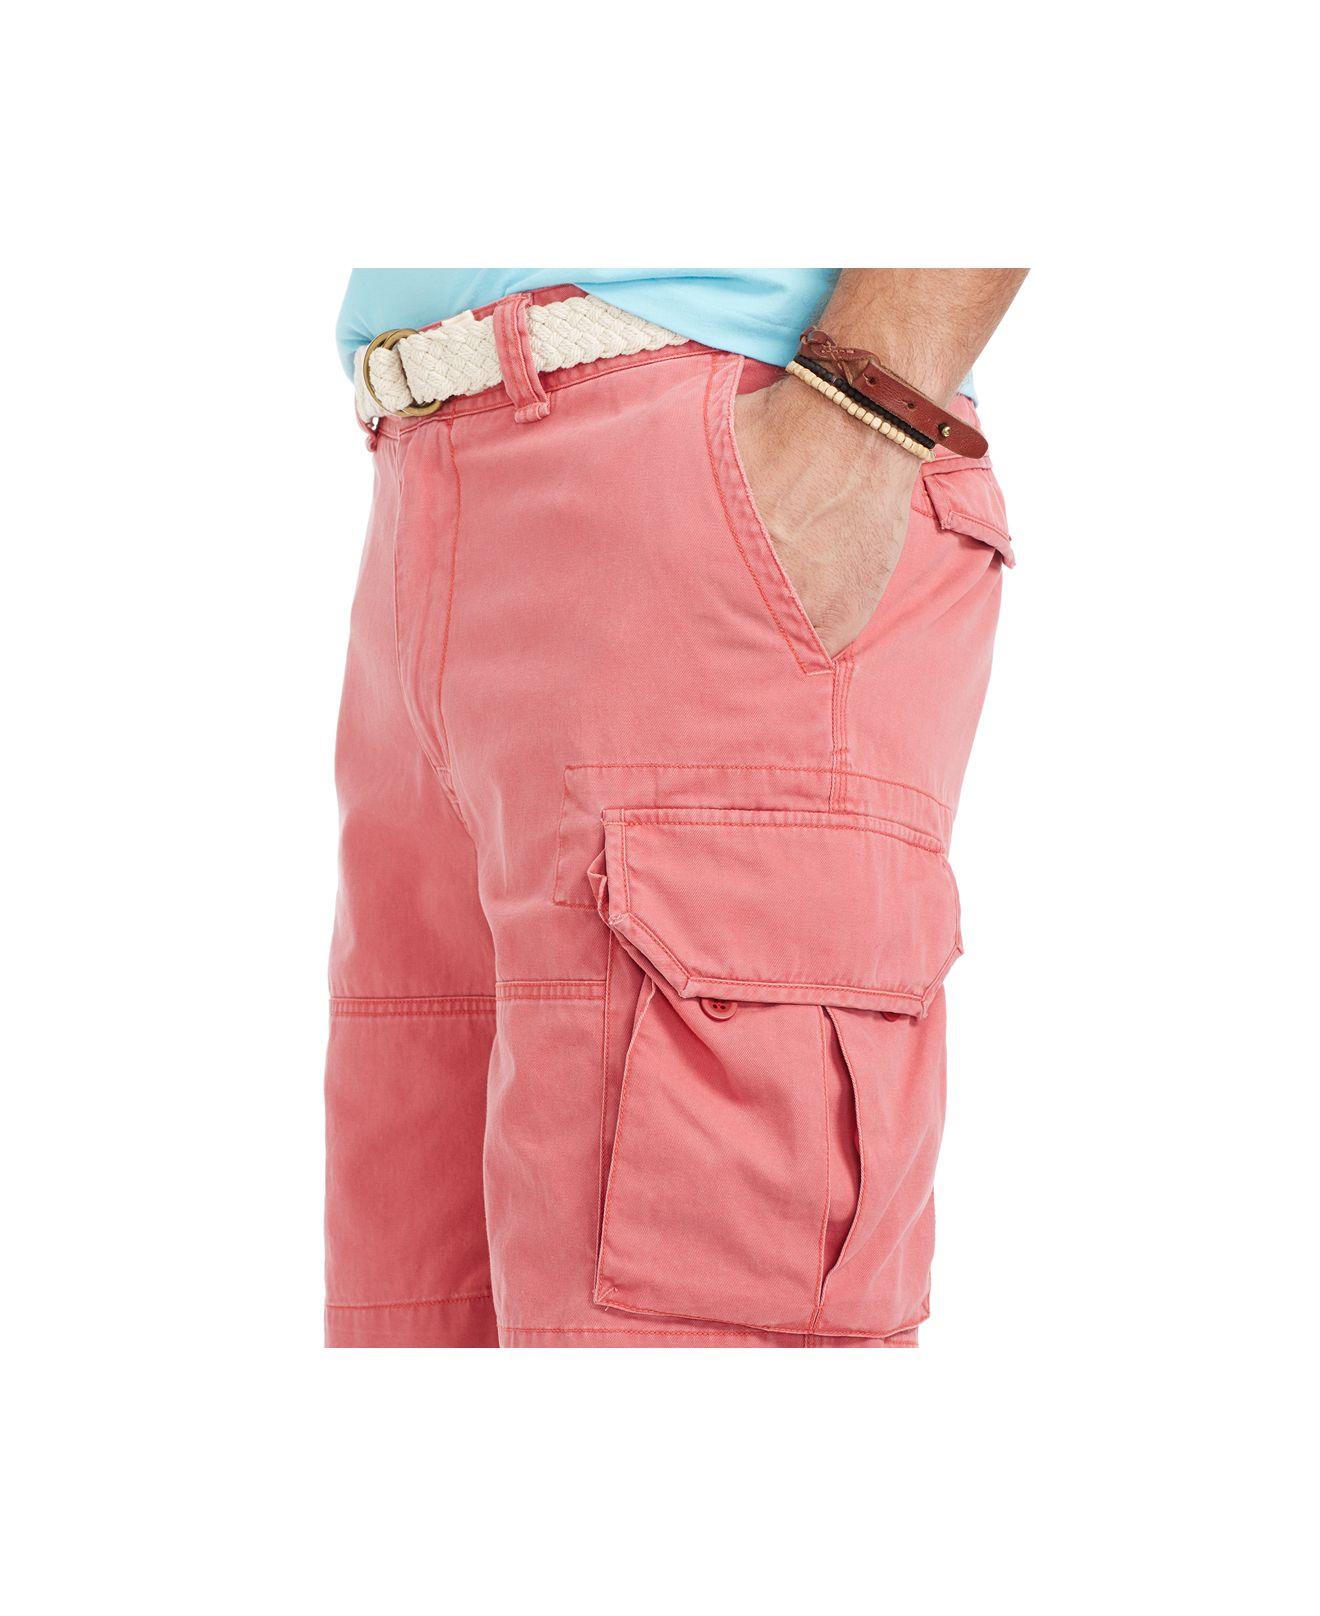 Red cargo shorts trendy clothes for Ralph lauren khaki paint